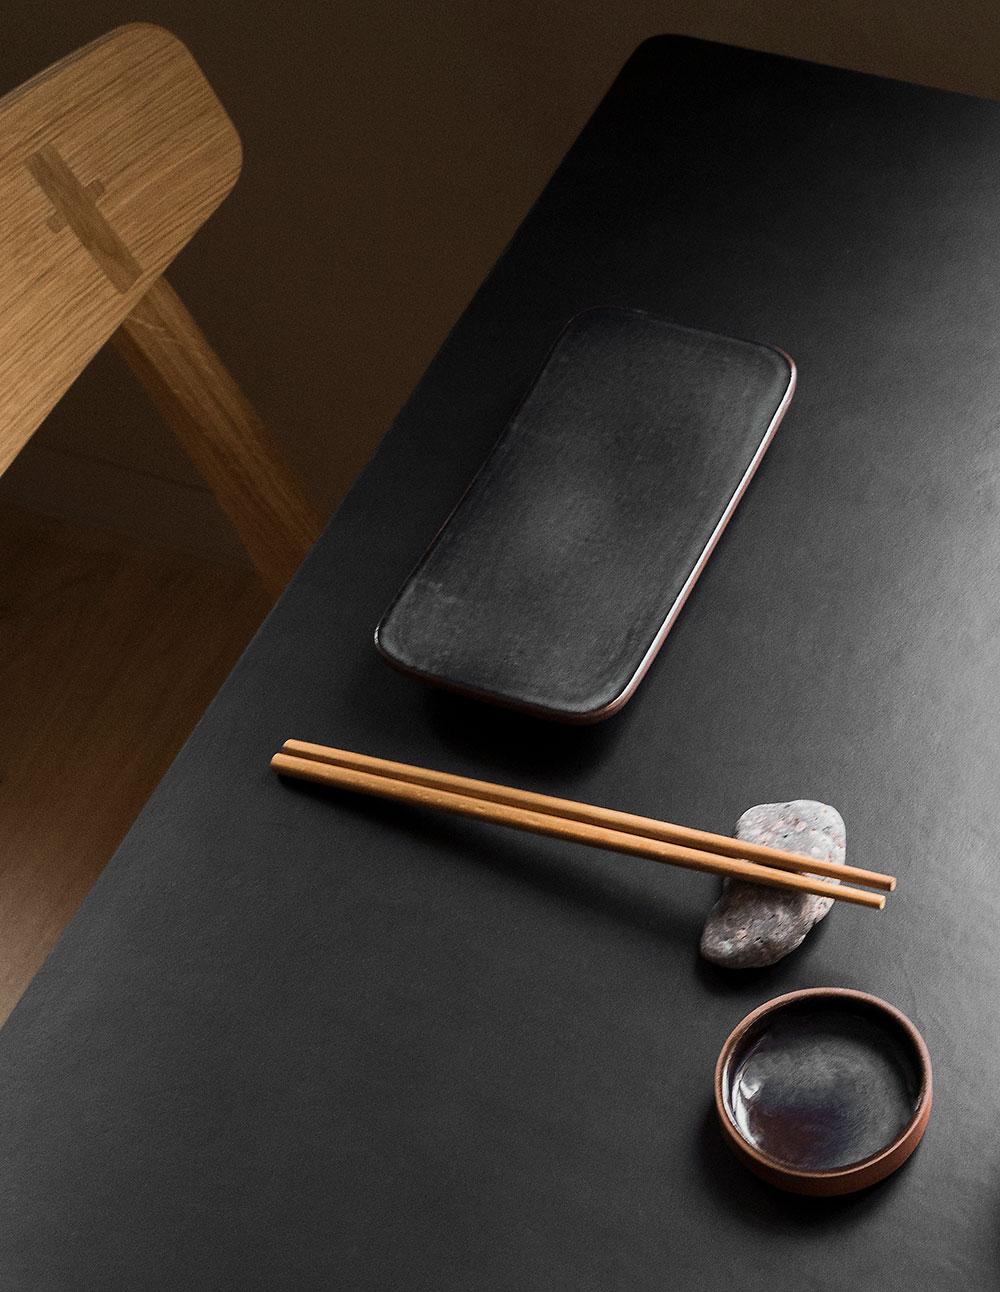 Scandinavian and Japanese aesthetics at London's new Sticks 'n' Sushi restaurant